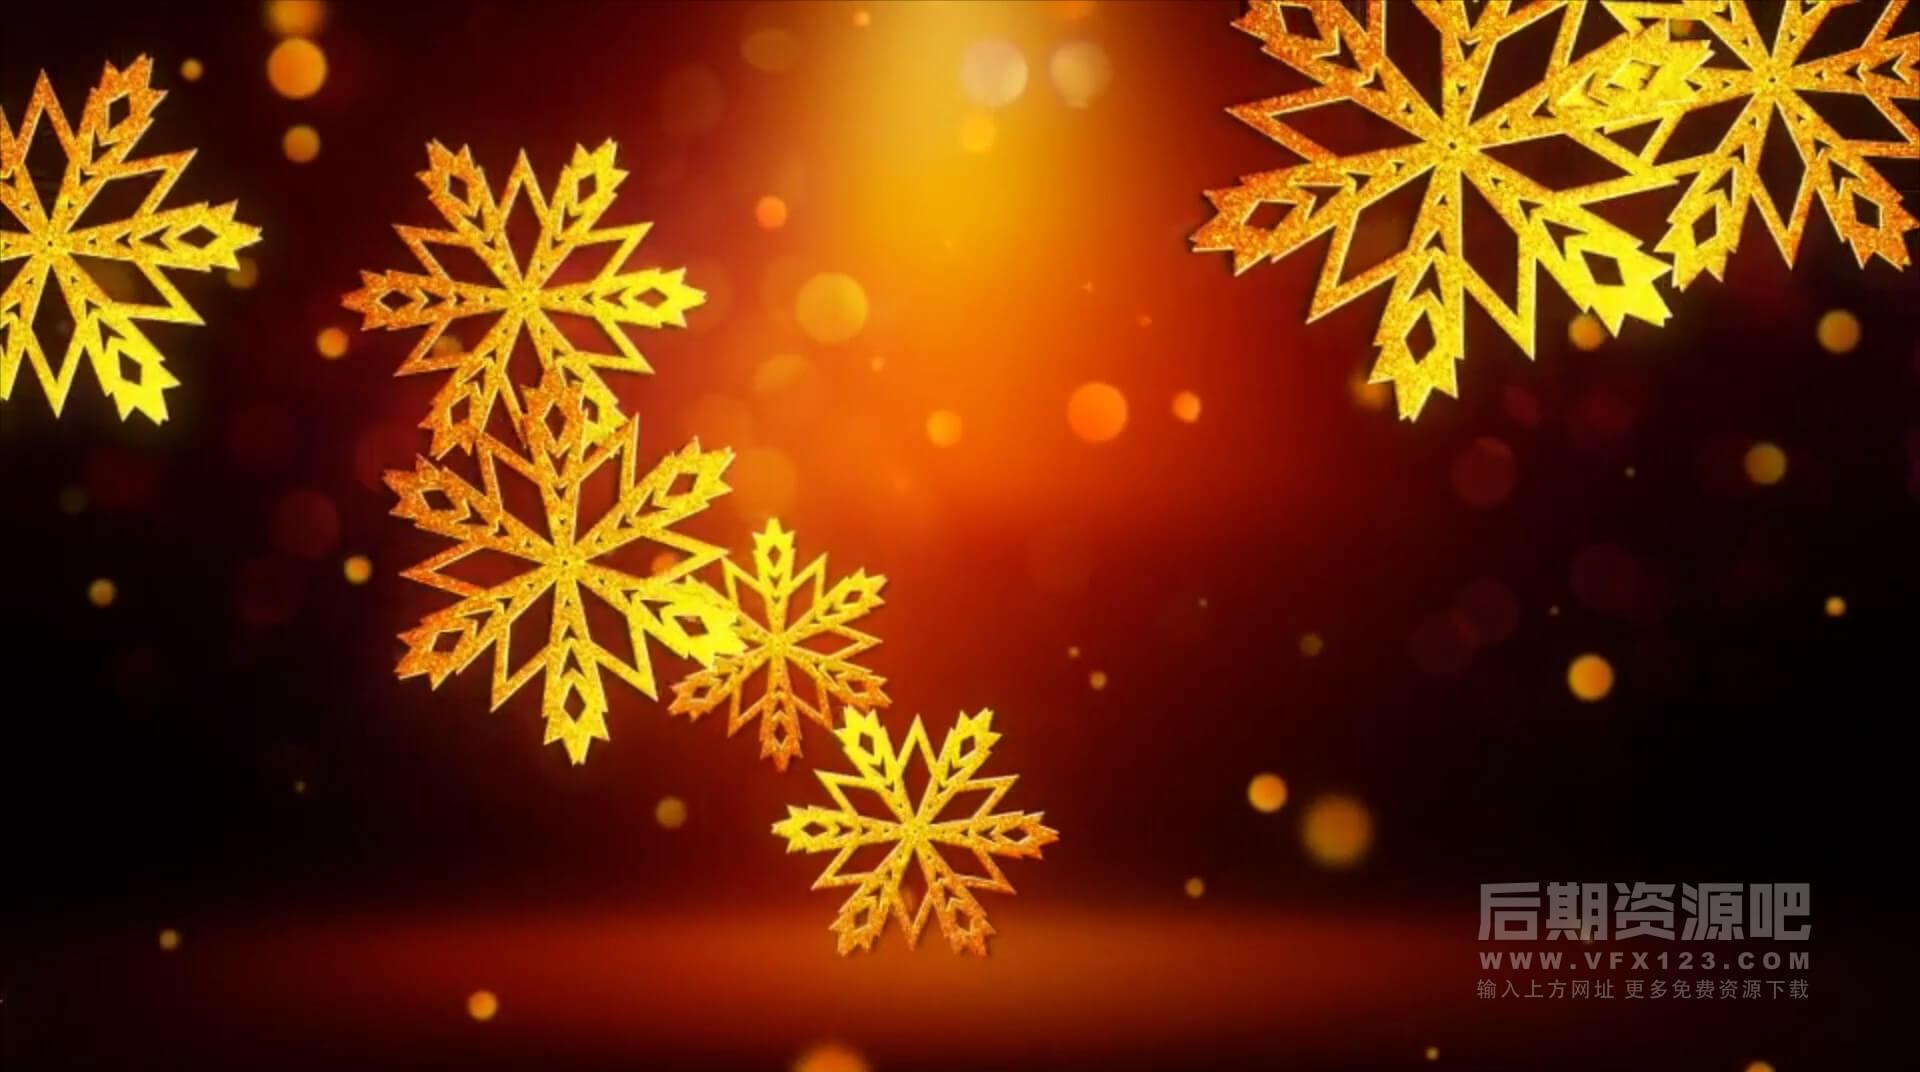 Motion模板 金色雪花粒子汇聚徽标LOGO展示模板 Snowflakes Logo